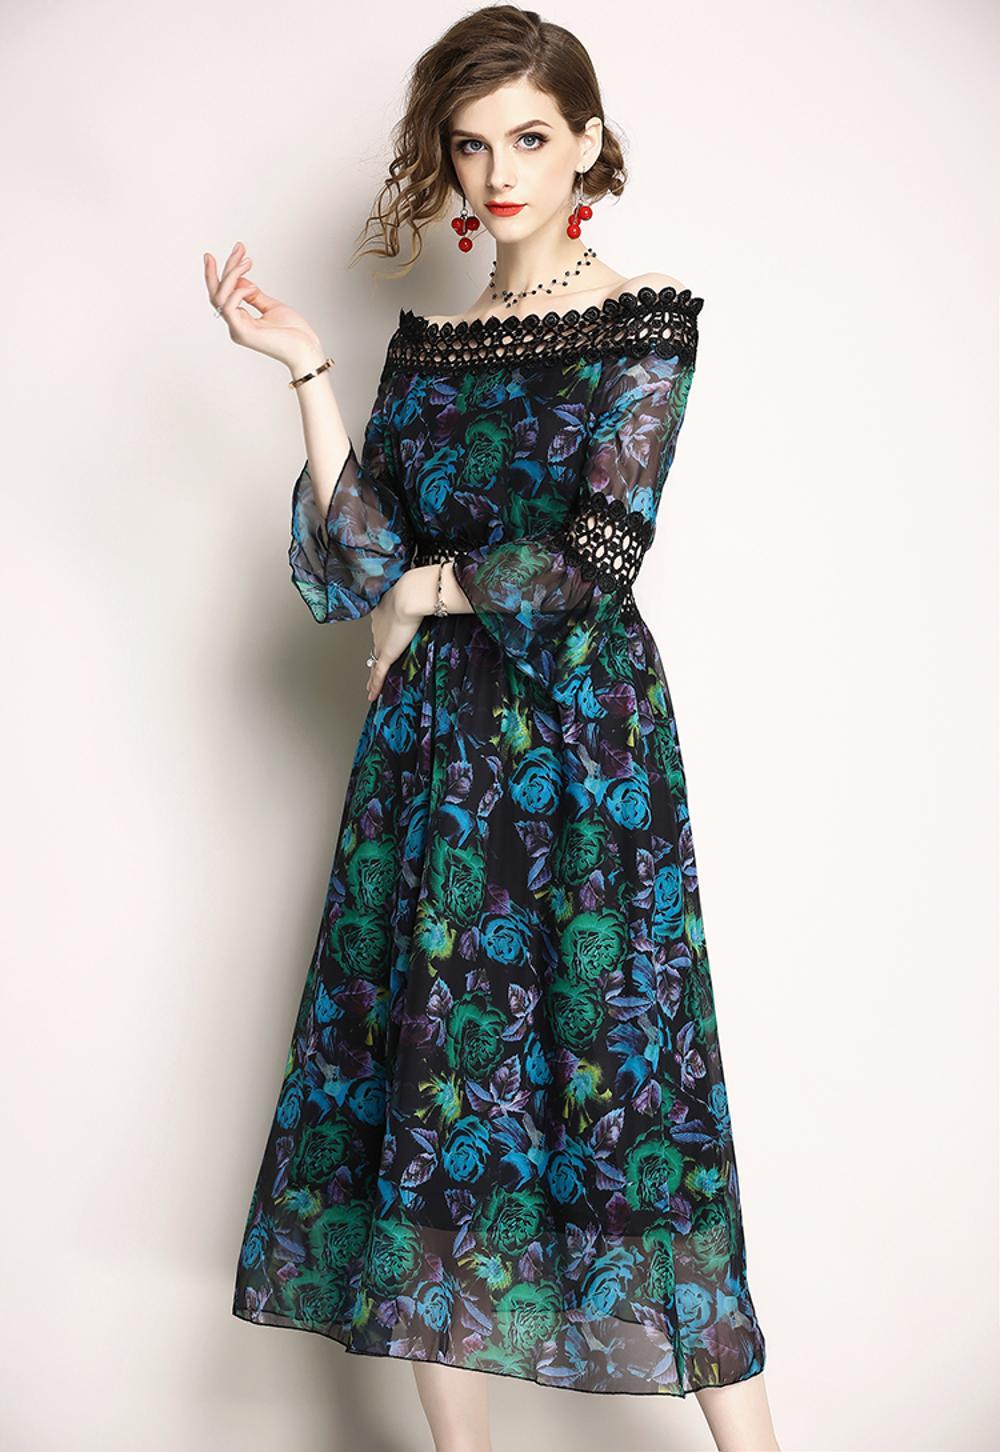 e07be9d455fa Wholesale-Peacock-Print-Silk-Chiffon-Dress.jpg